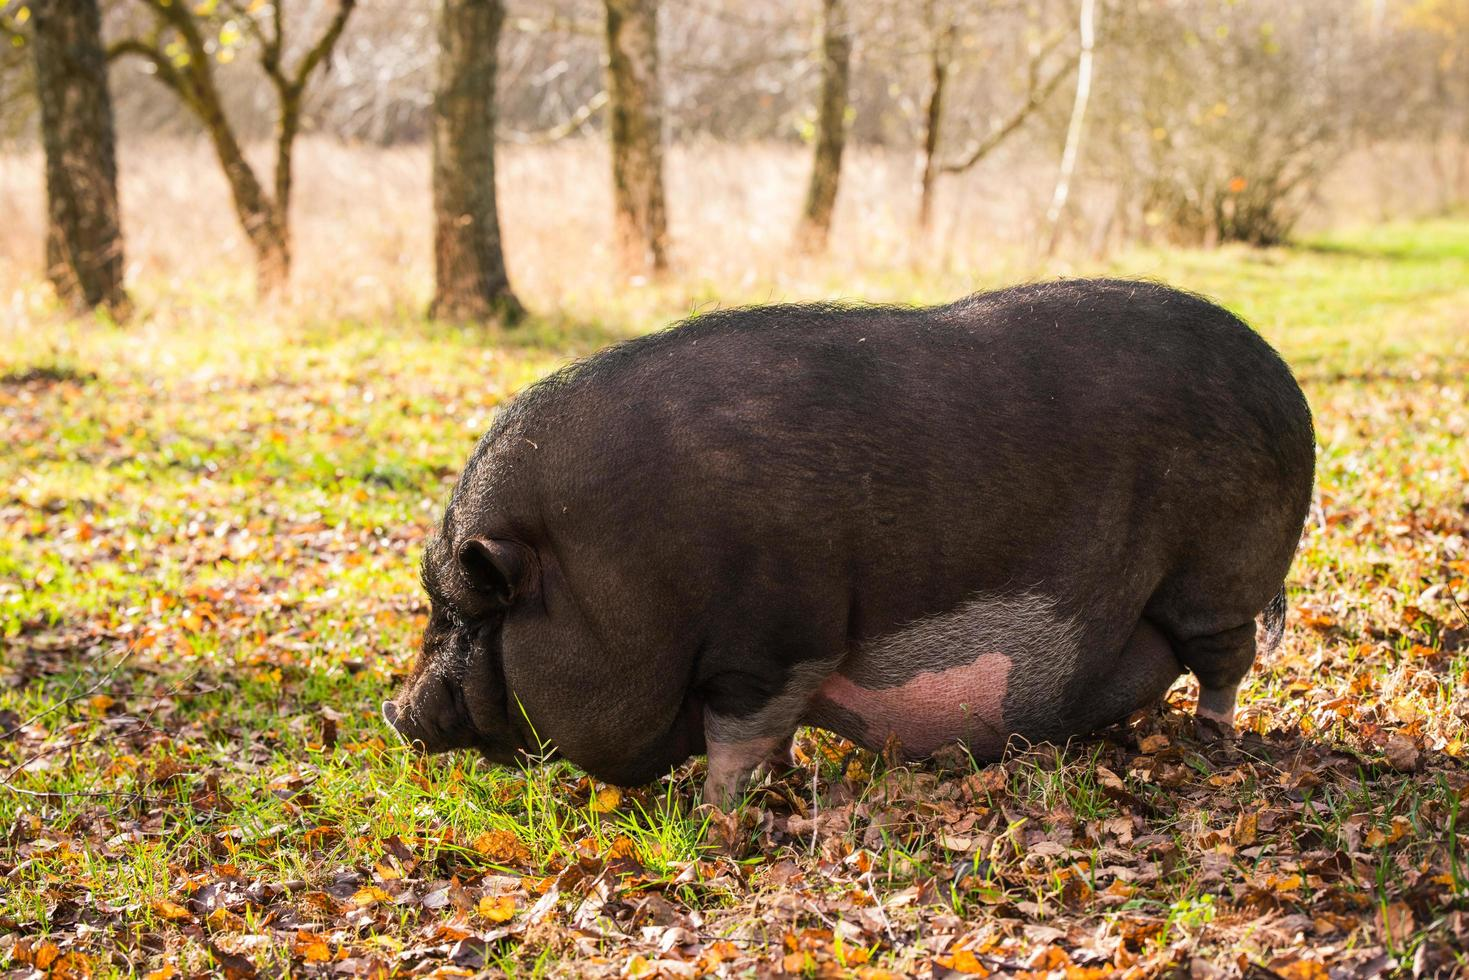 Pig in a field photo